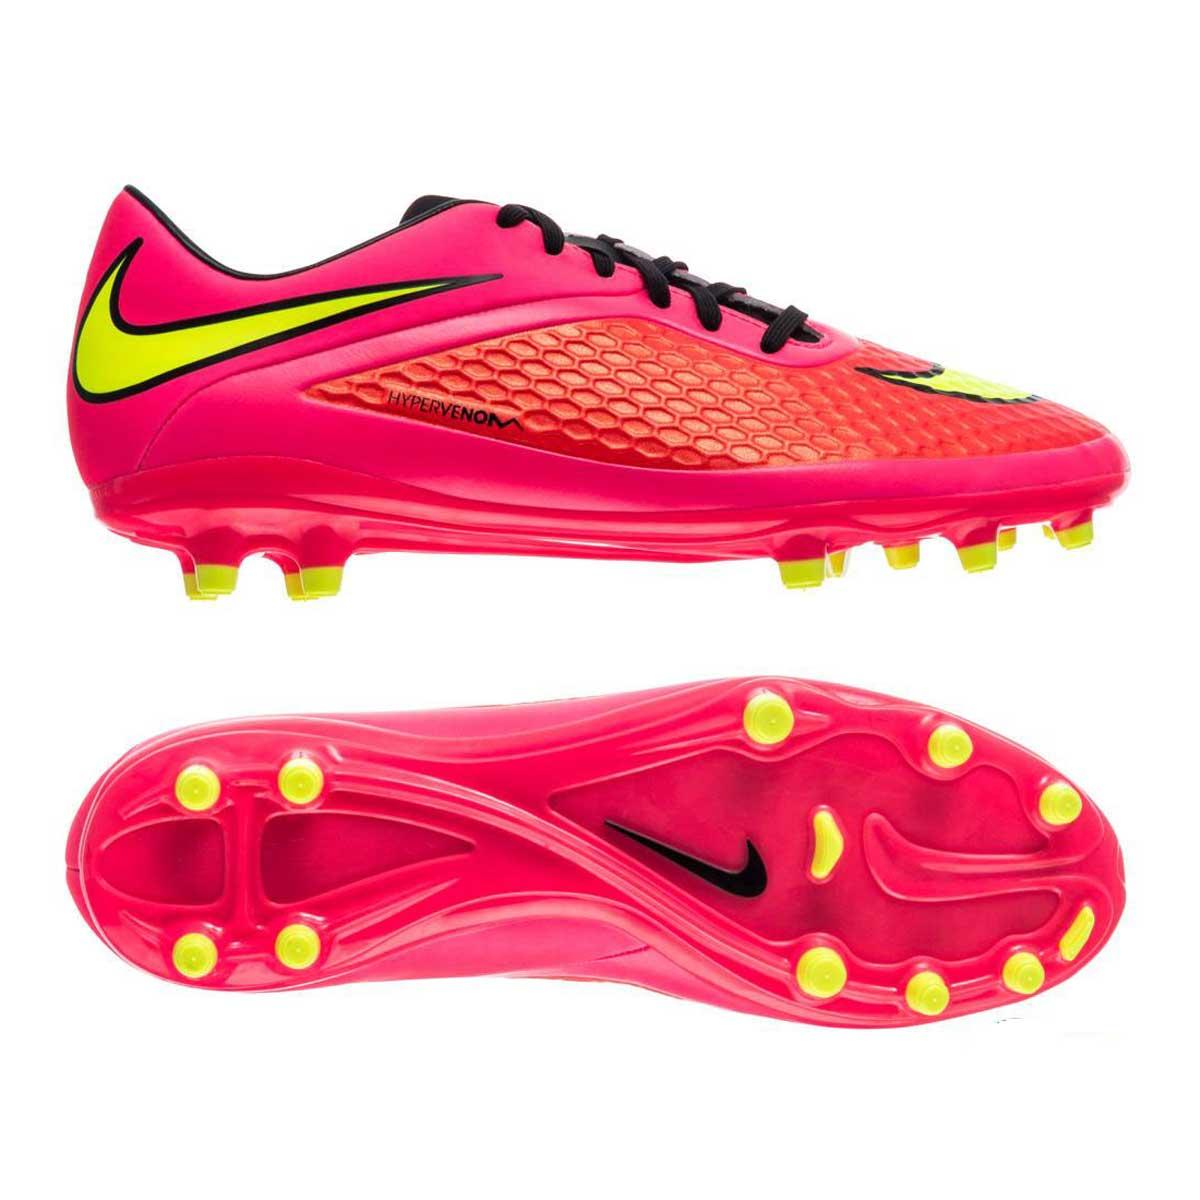 3678eaa561cb Buy Nike Hypervenom Phelon FG Football Shoes Online India|Soccer Shoes